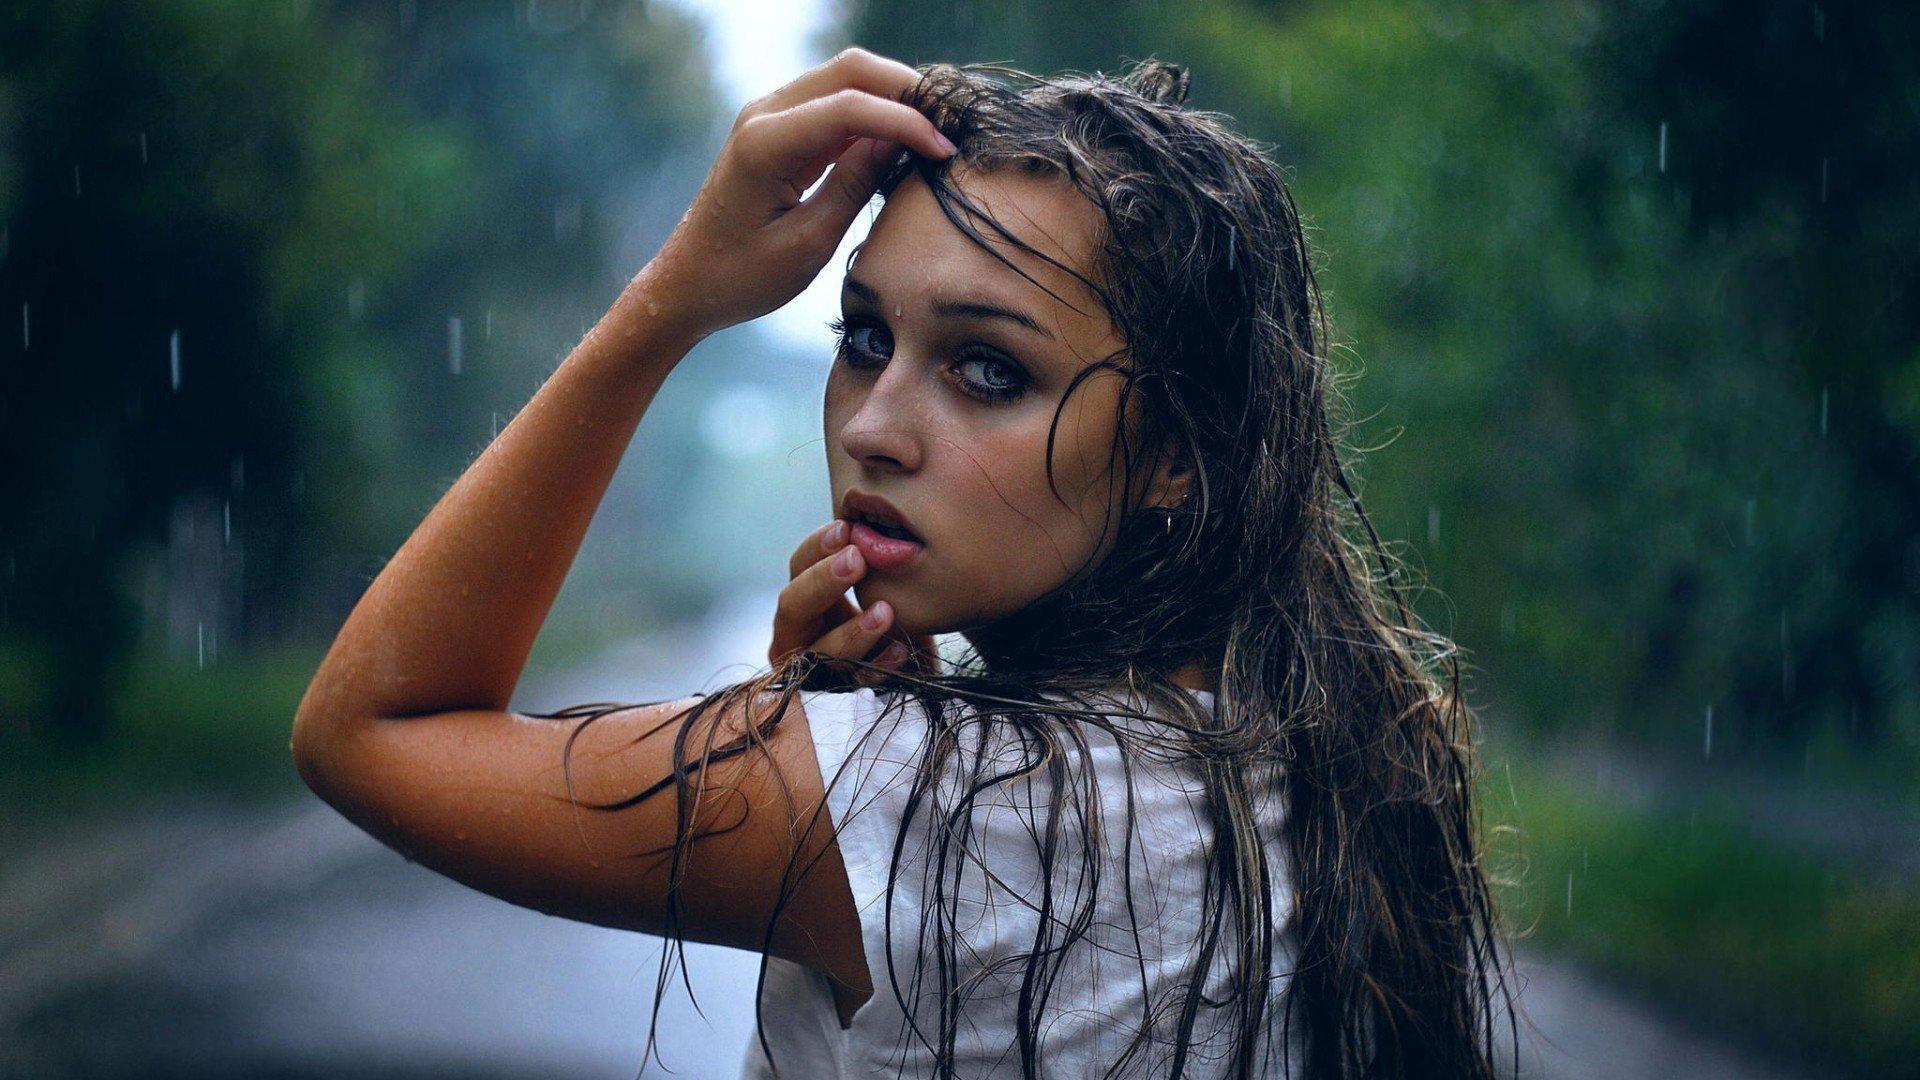 1920X1080 Girl In Rain Laptop Full Hd 1080P Hd 4K -7559